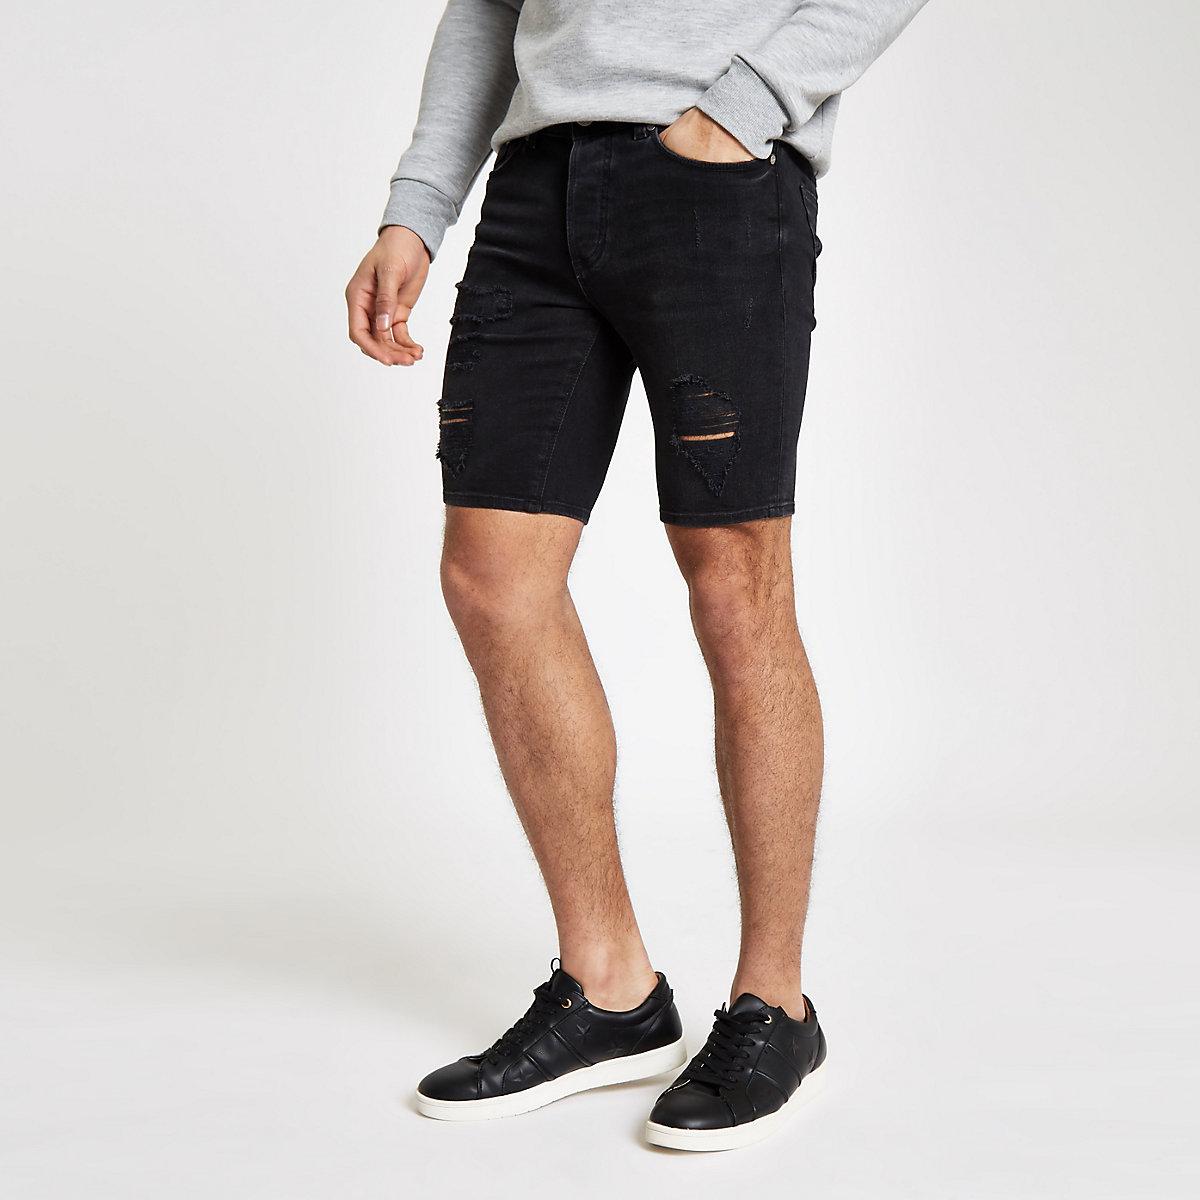 Black ripped skinny denim shorts